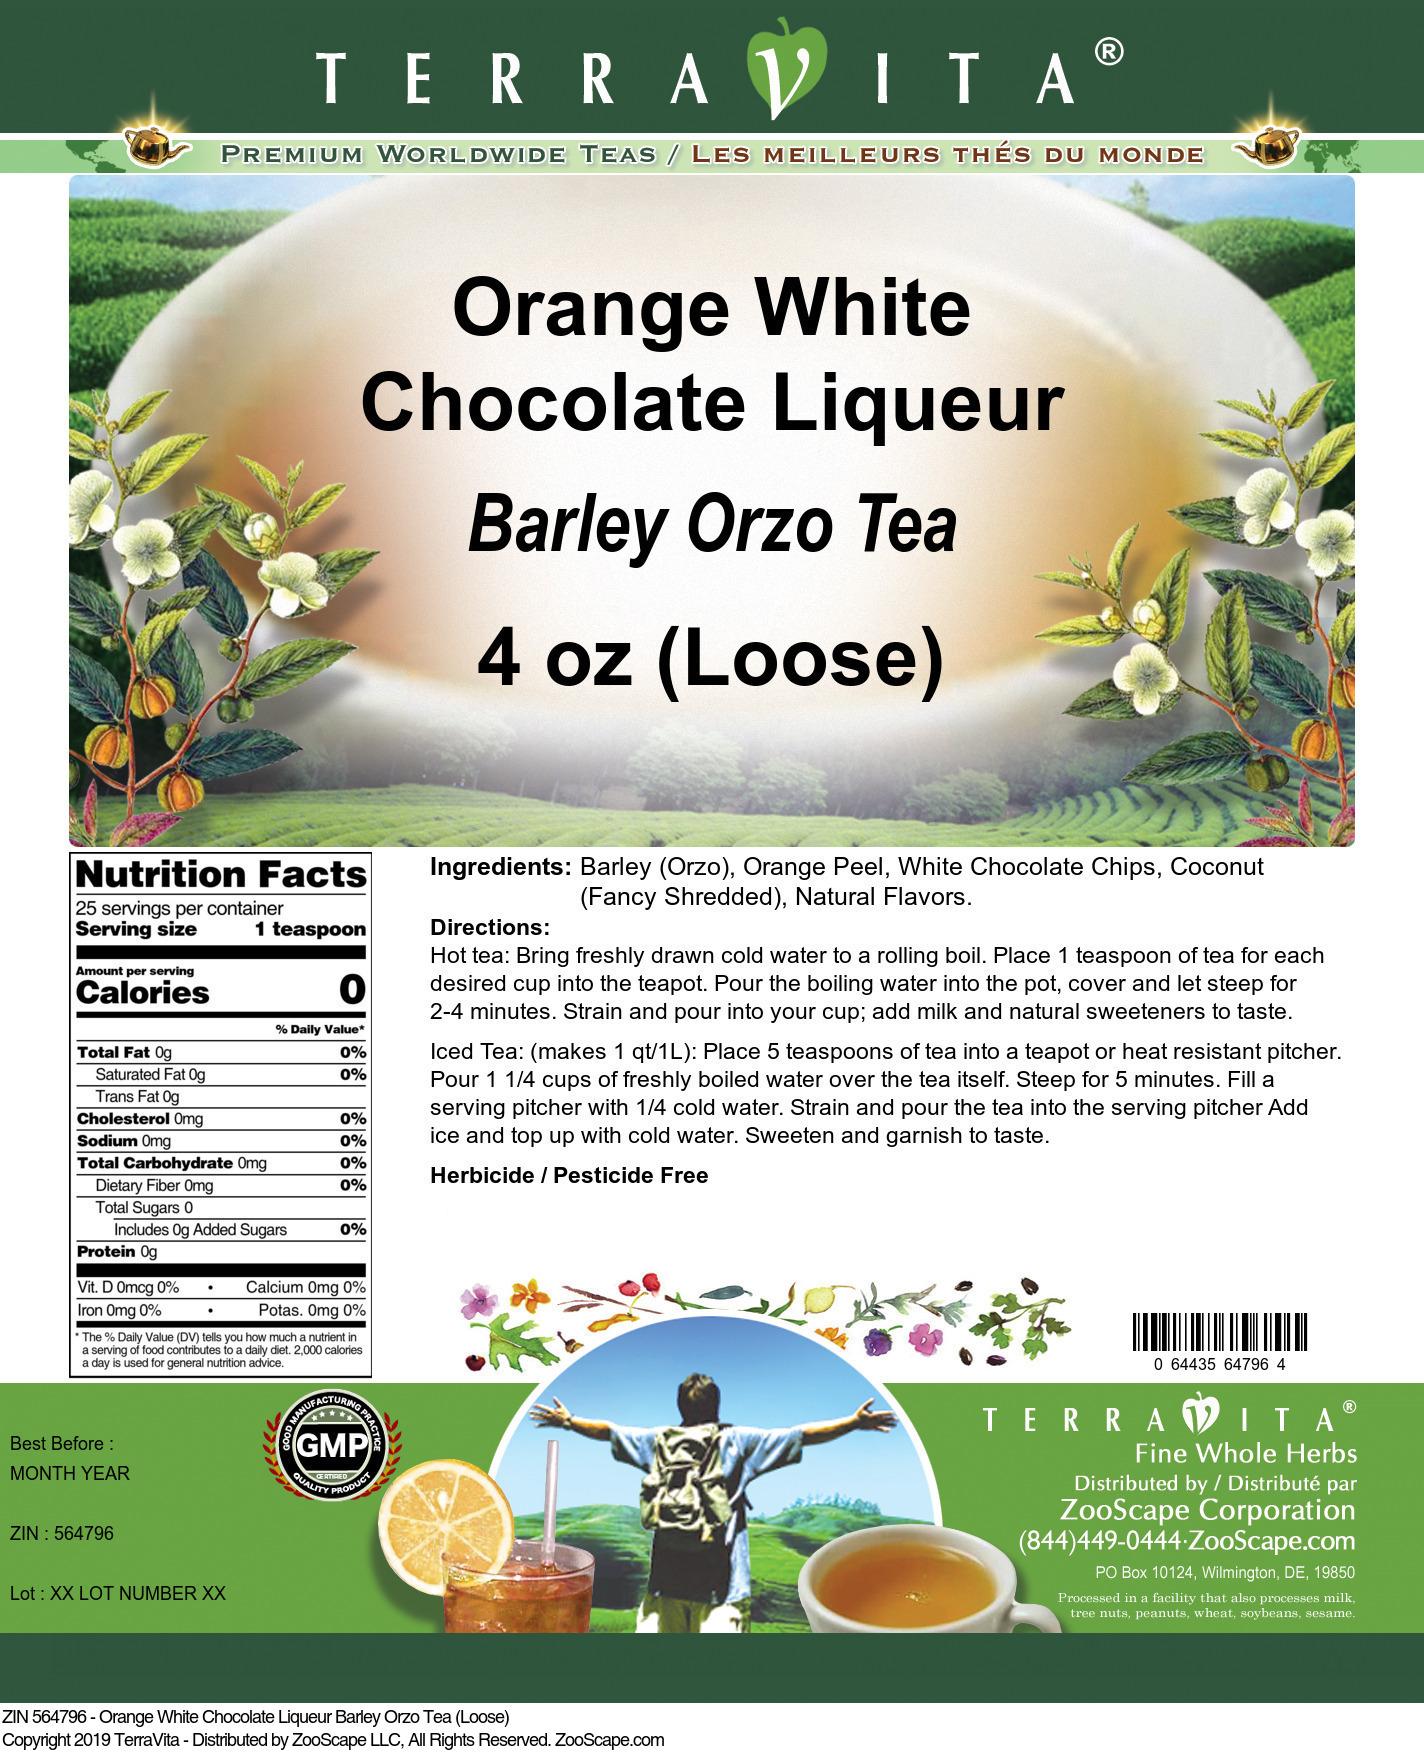 Orange White Chocolate Liqueur Barley Orzo